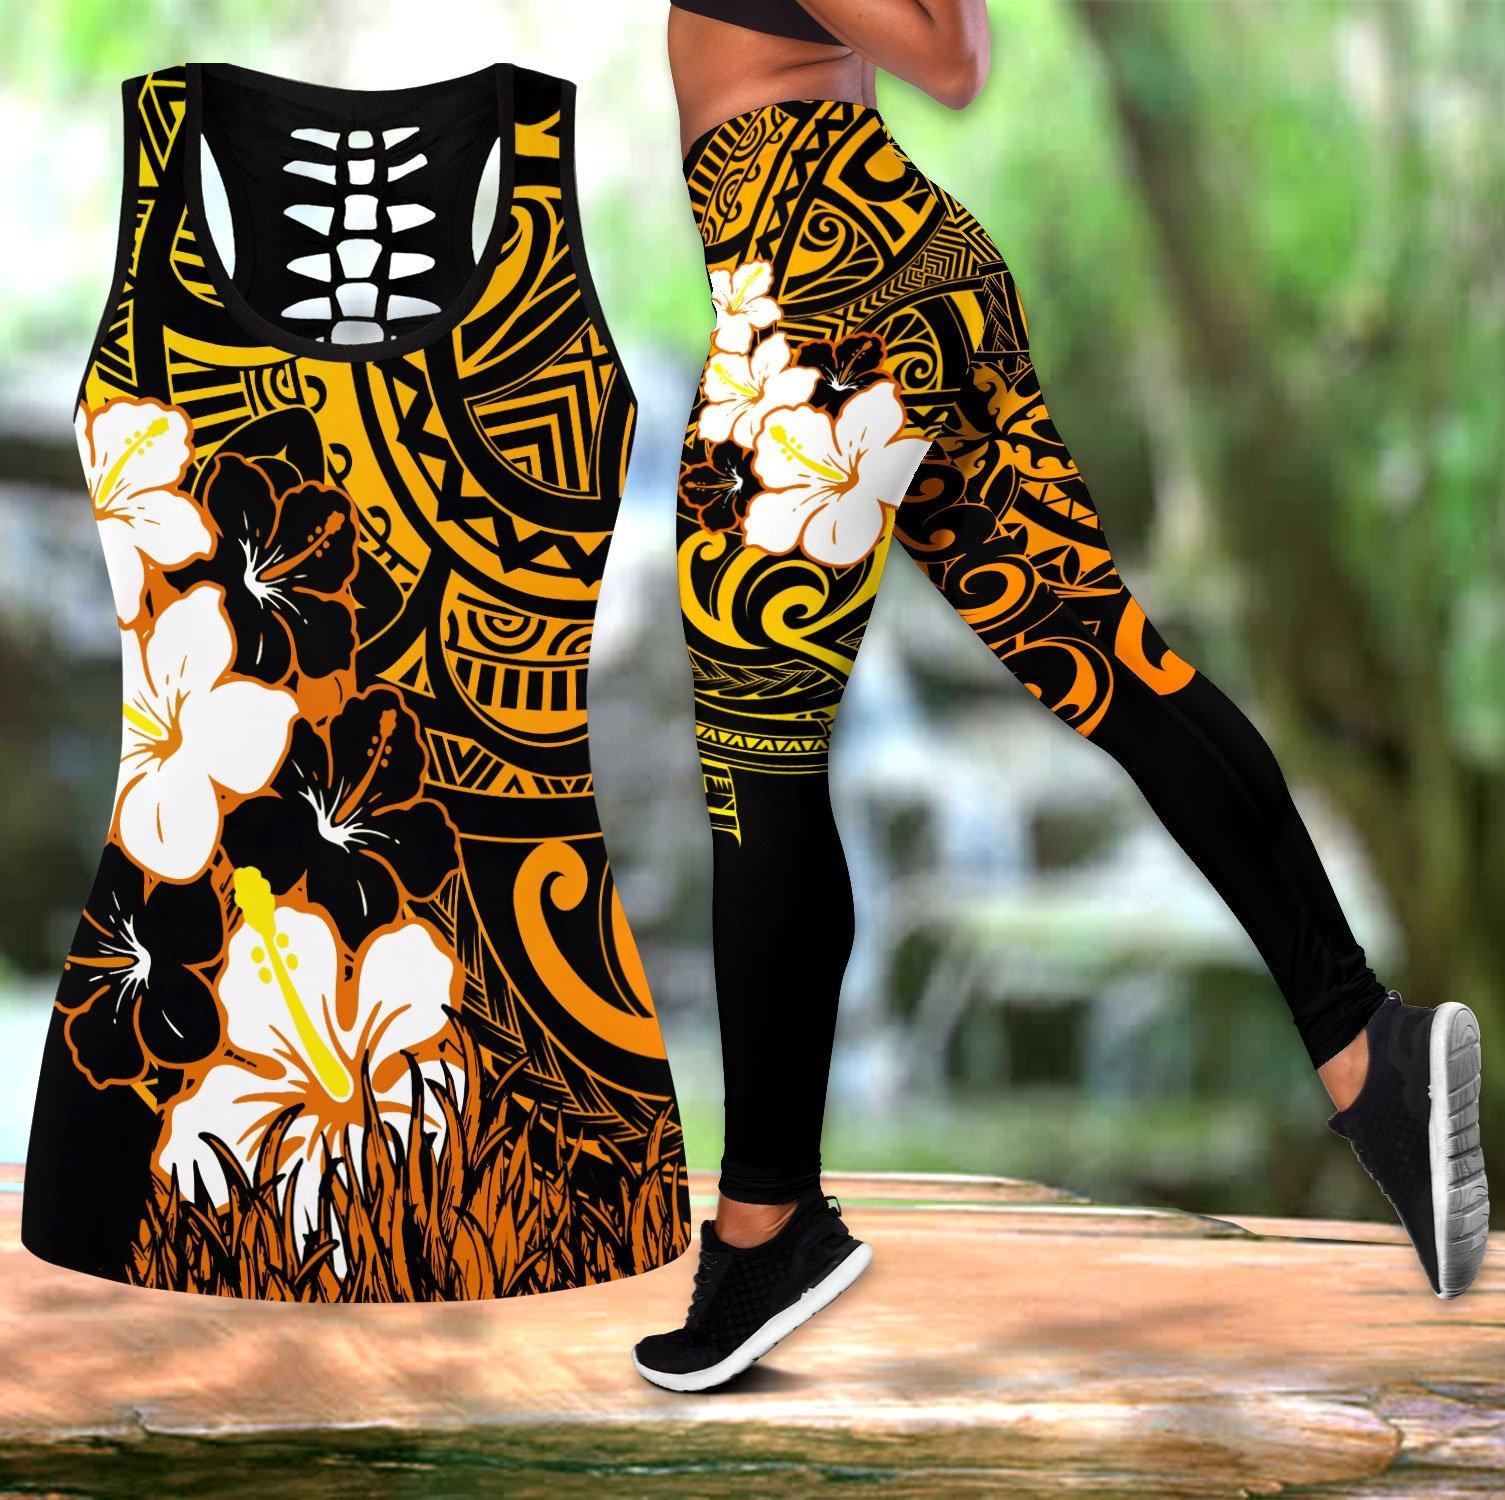 Pohnpei Polynesian Tattoo Turtle Flowers 3D All Over Printed Legging & Tank top Sexy Elastic Female Skinny Leggings DDK42